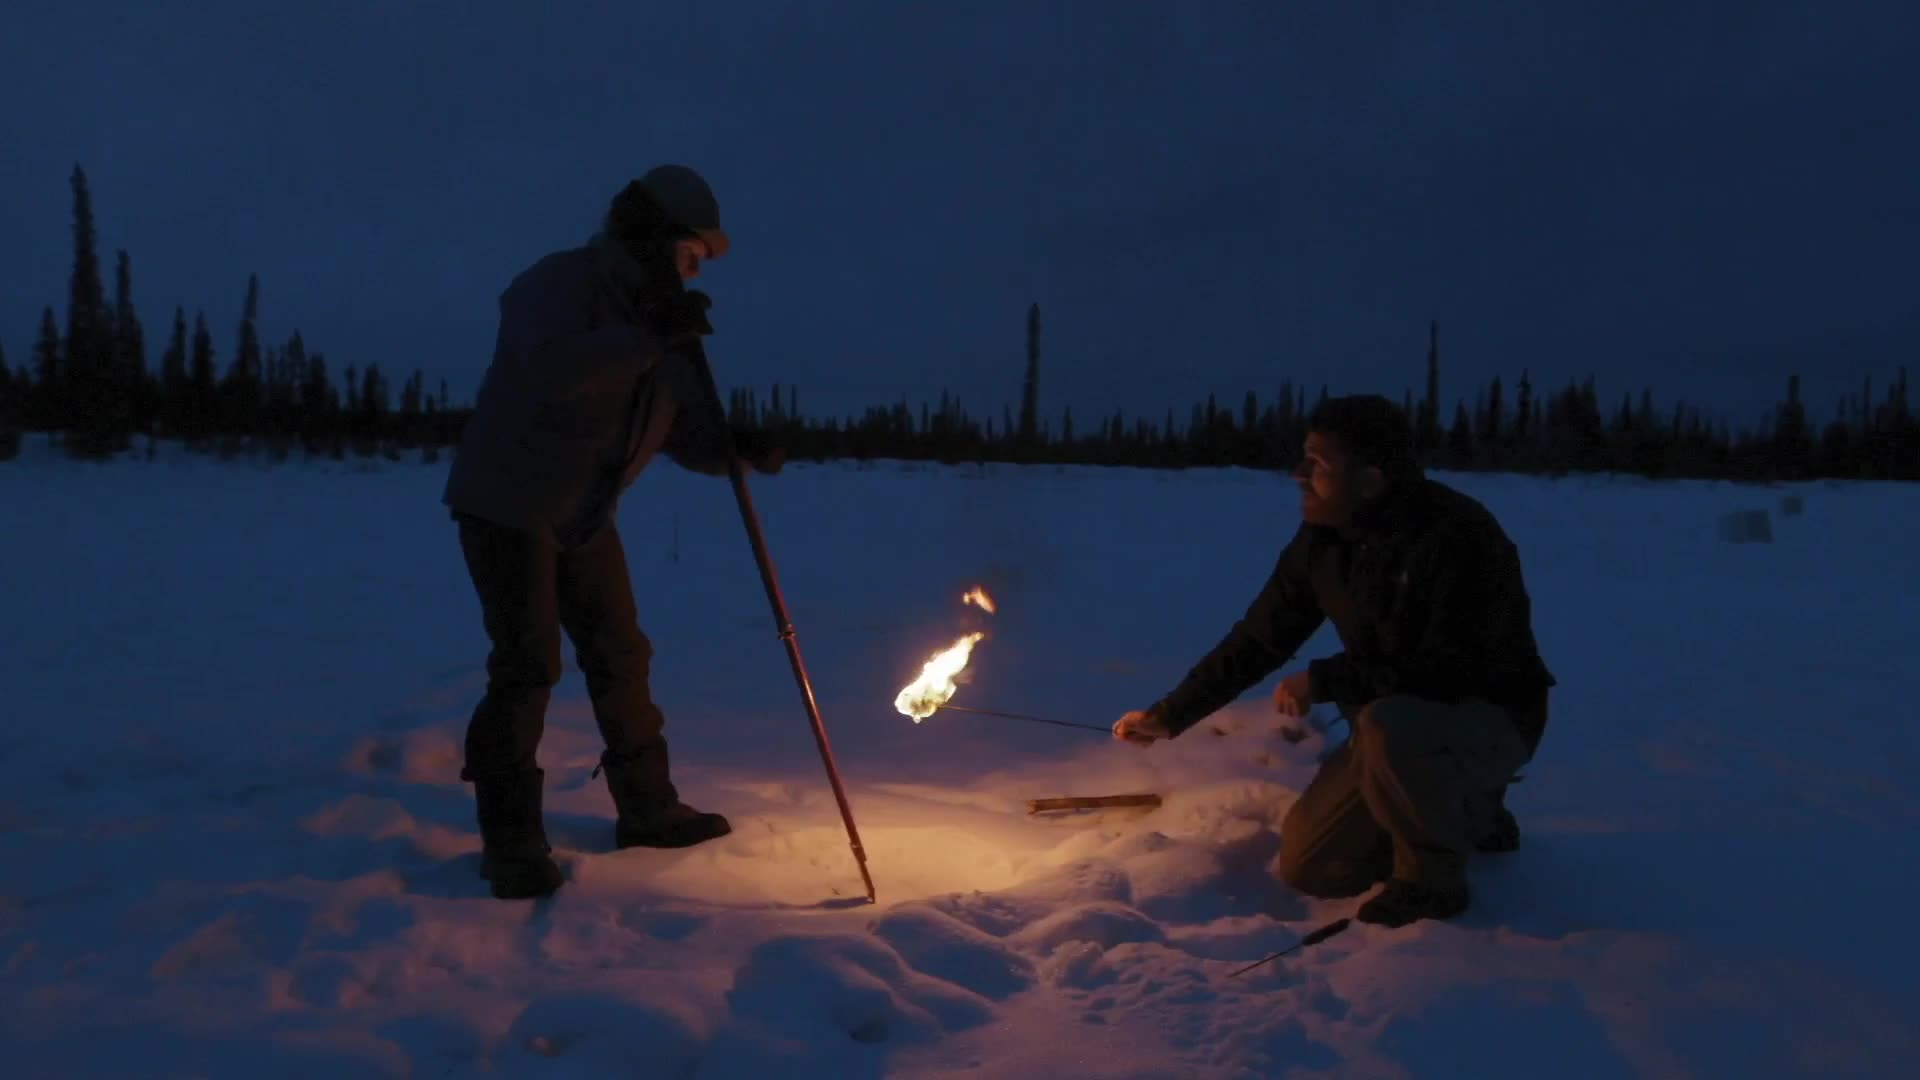 PlayingWithFire, noisygifs, Igniting methane trapped under ice GIFs